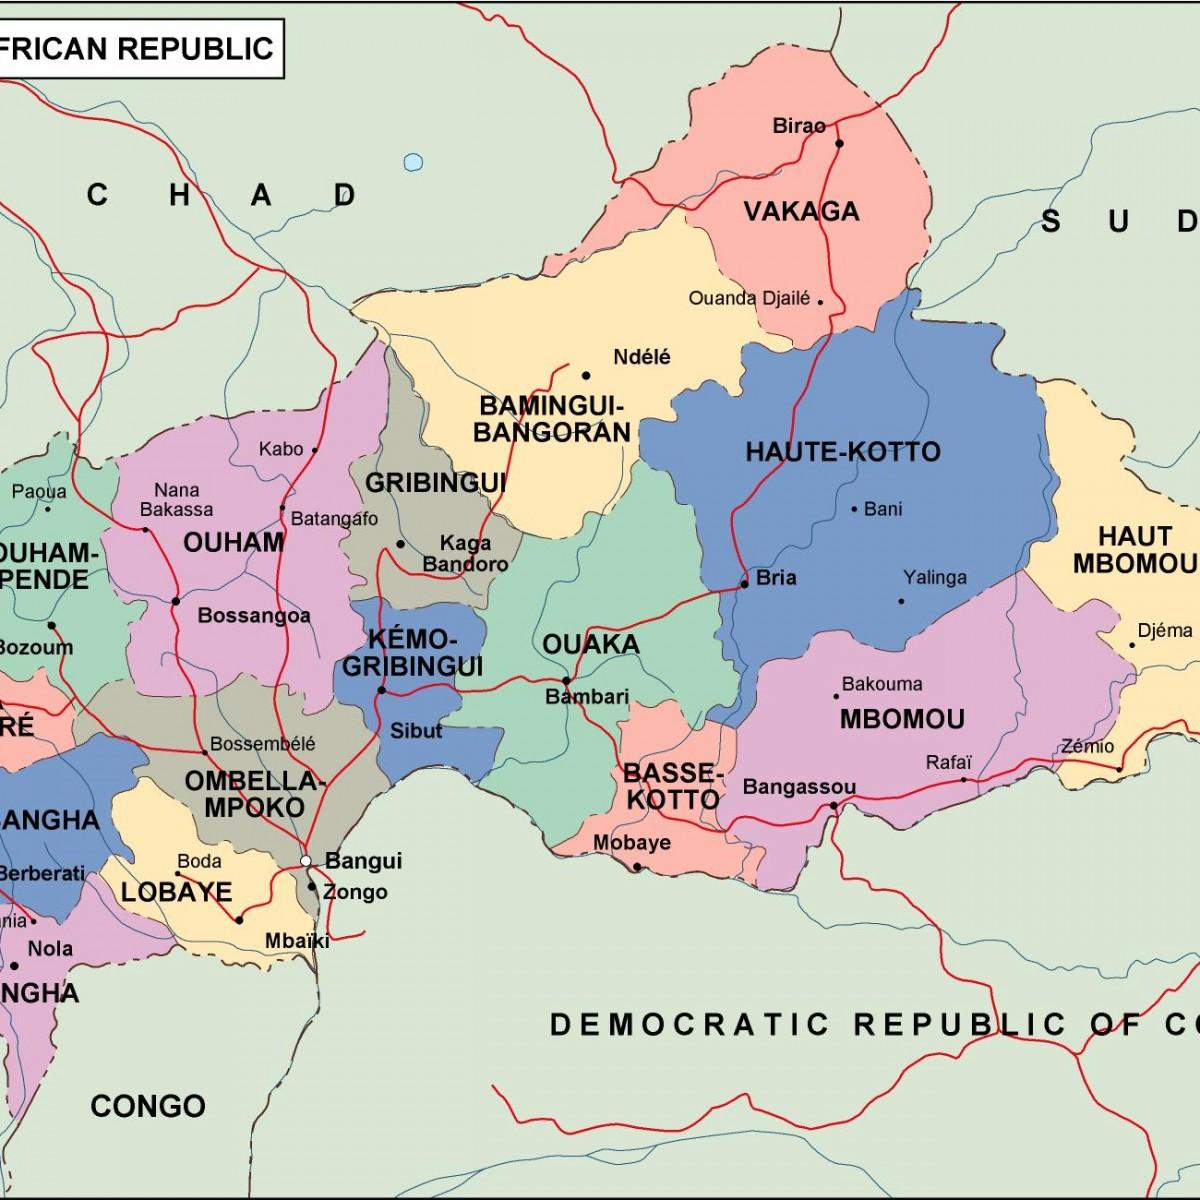 central africa political map. Vector Eps maps. Eps Illustrator Map on